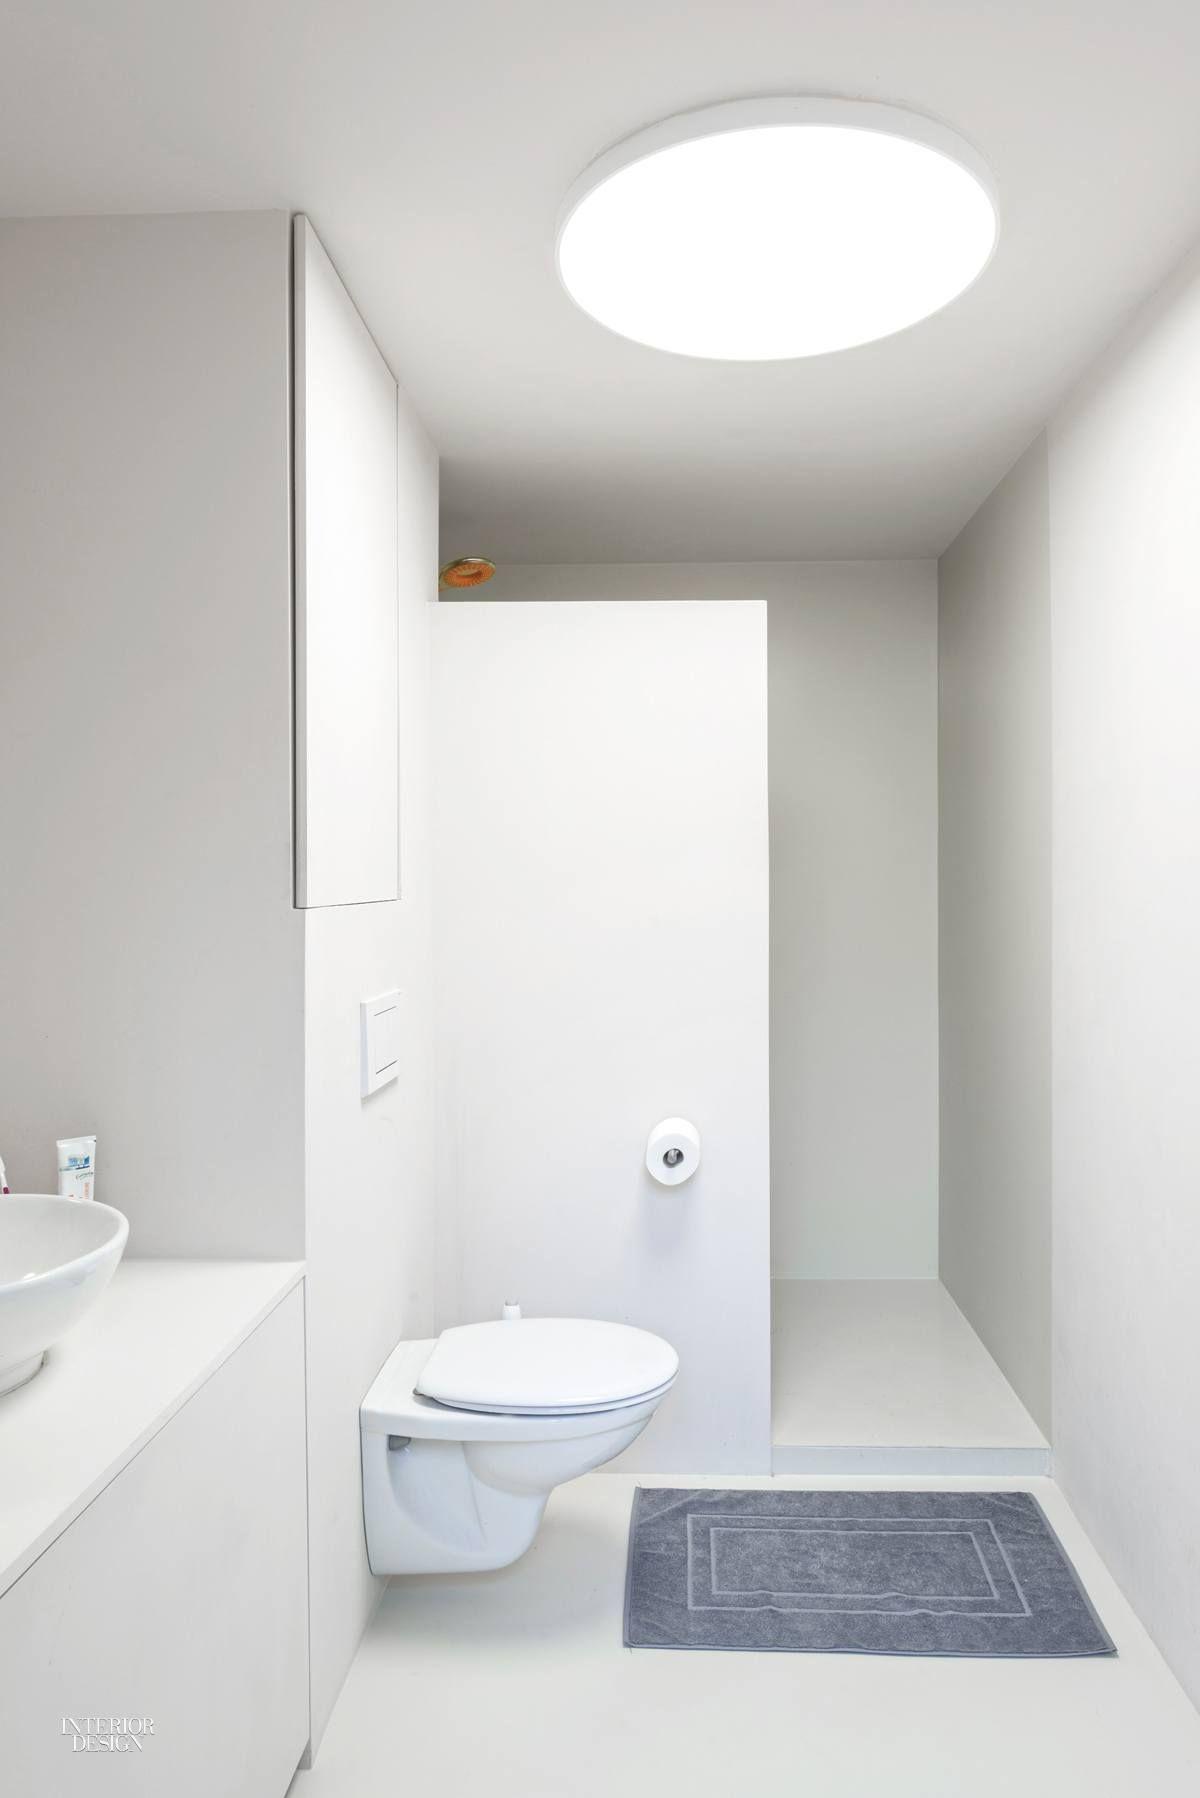 Snazzy Bathroom Remodel  June, 2018